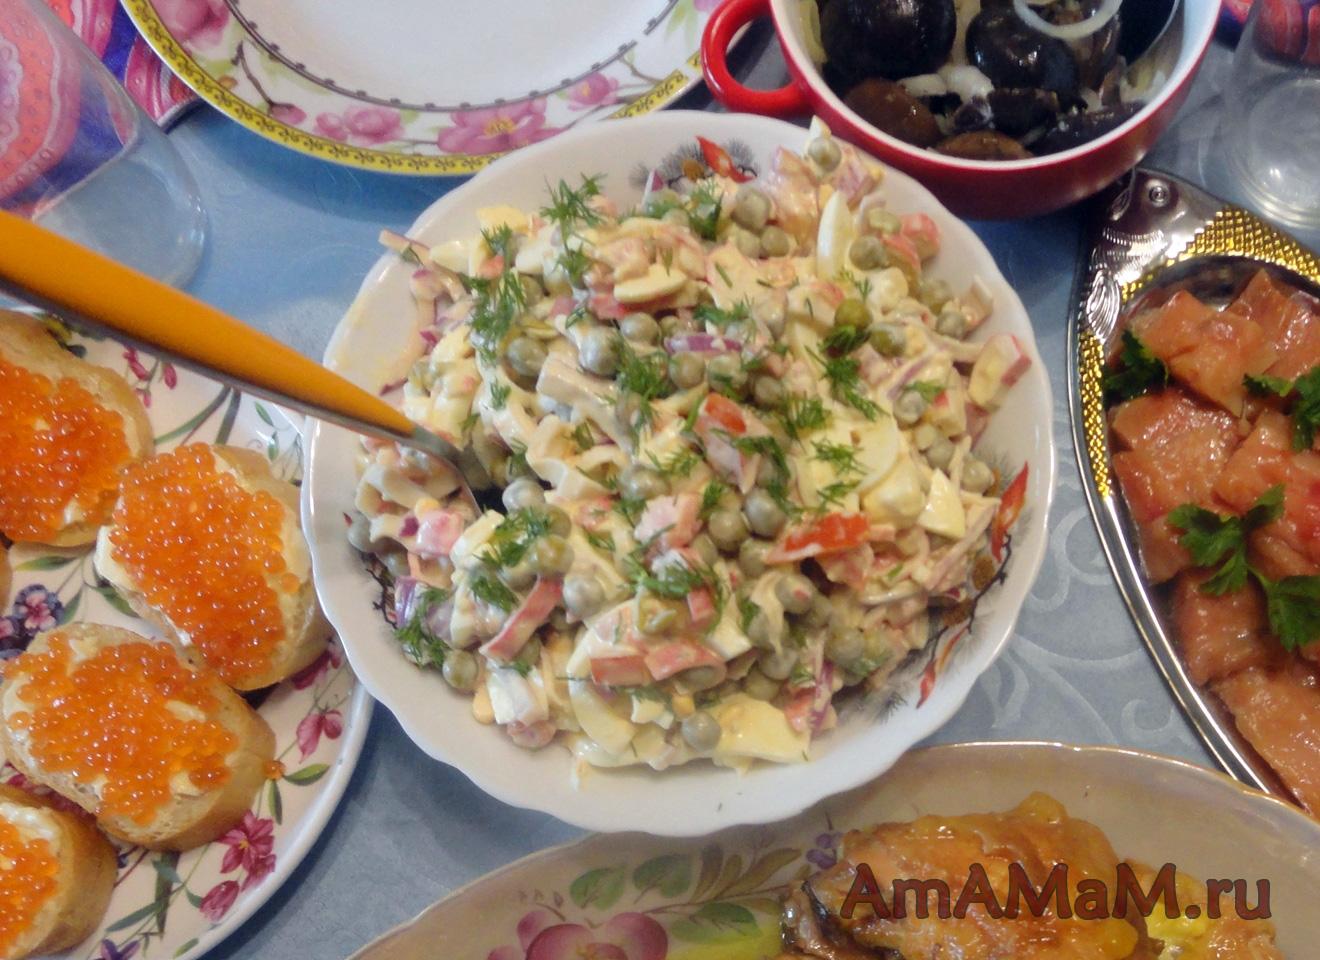 салат с помидором огурцом и крабовыми палочками